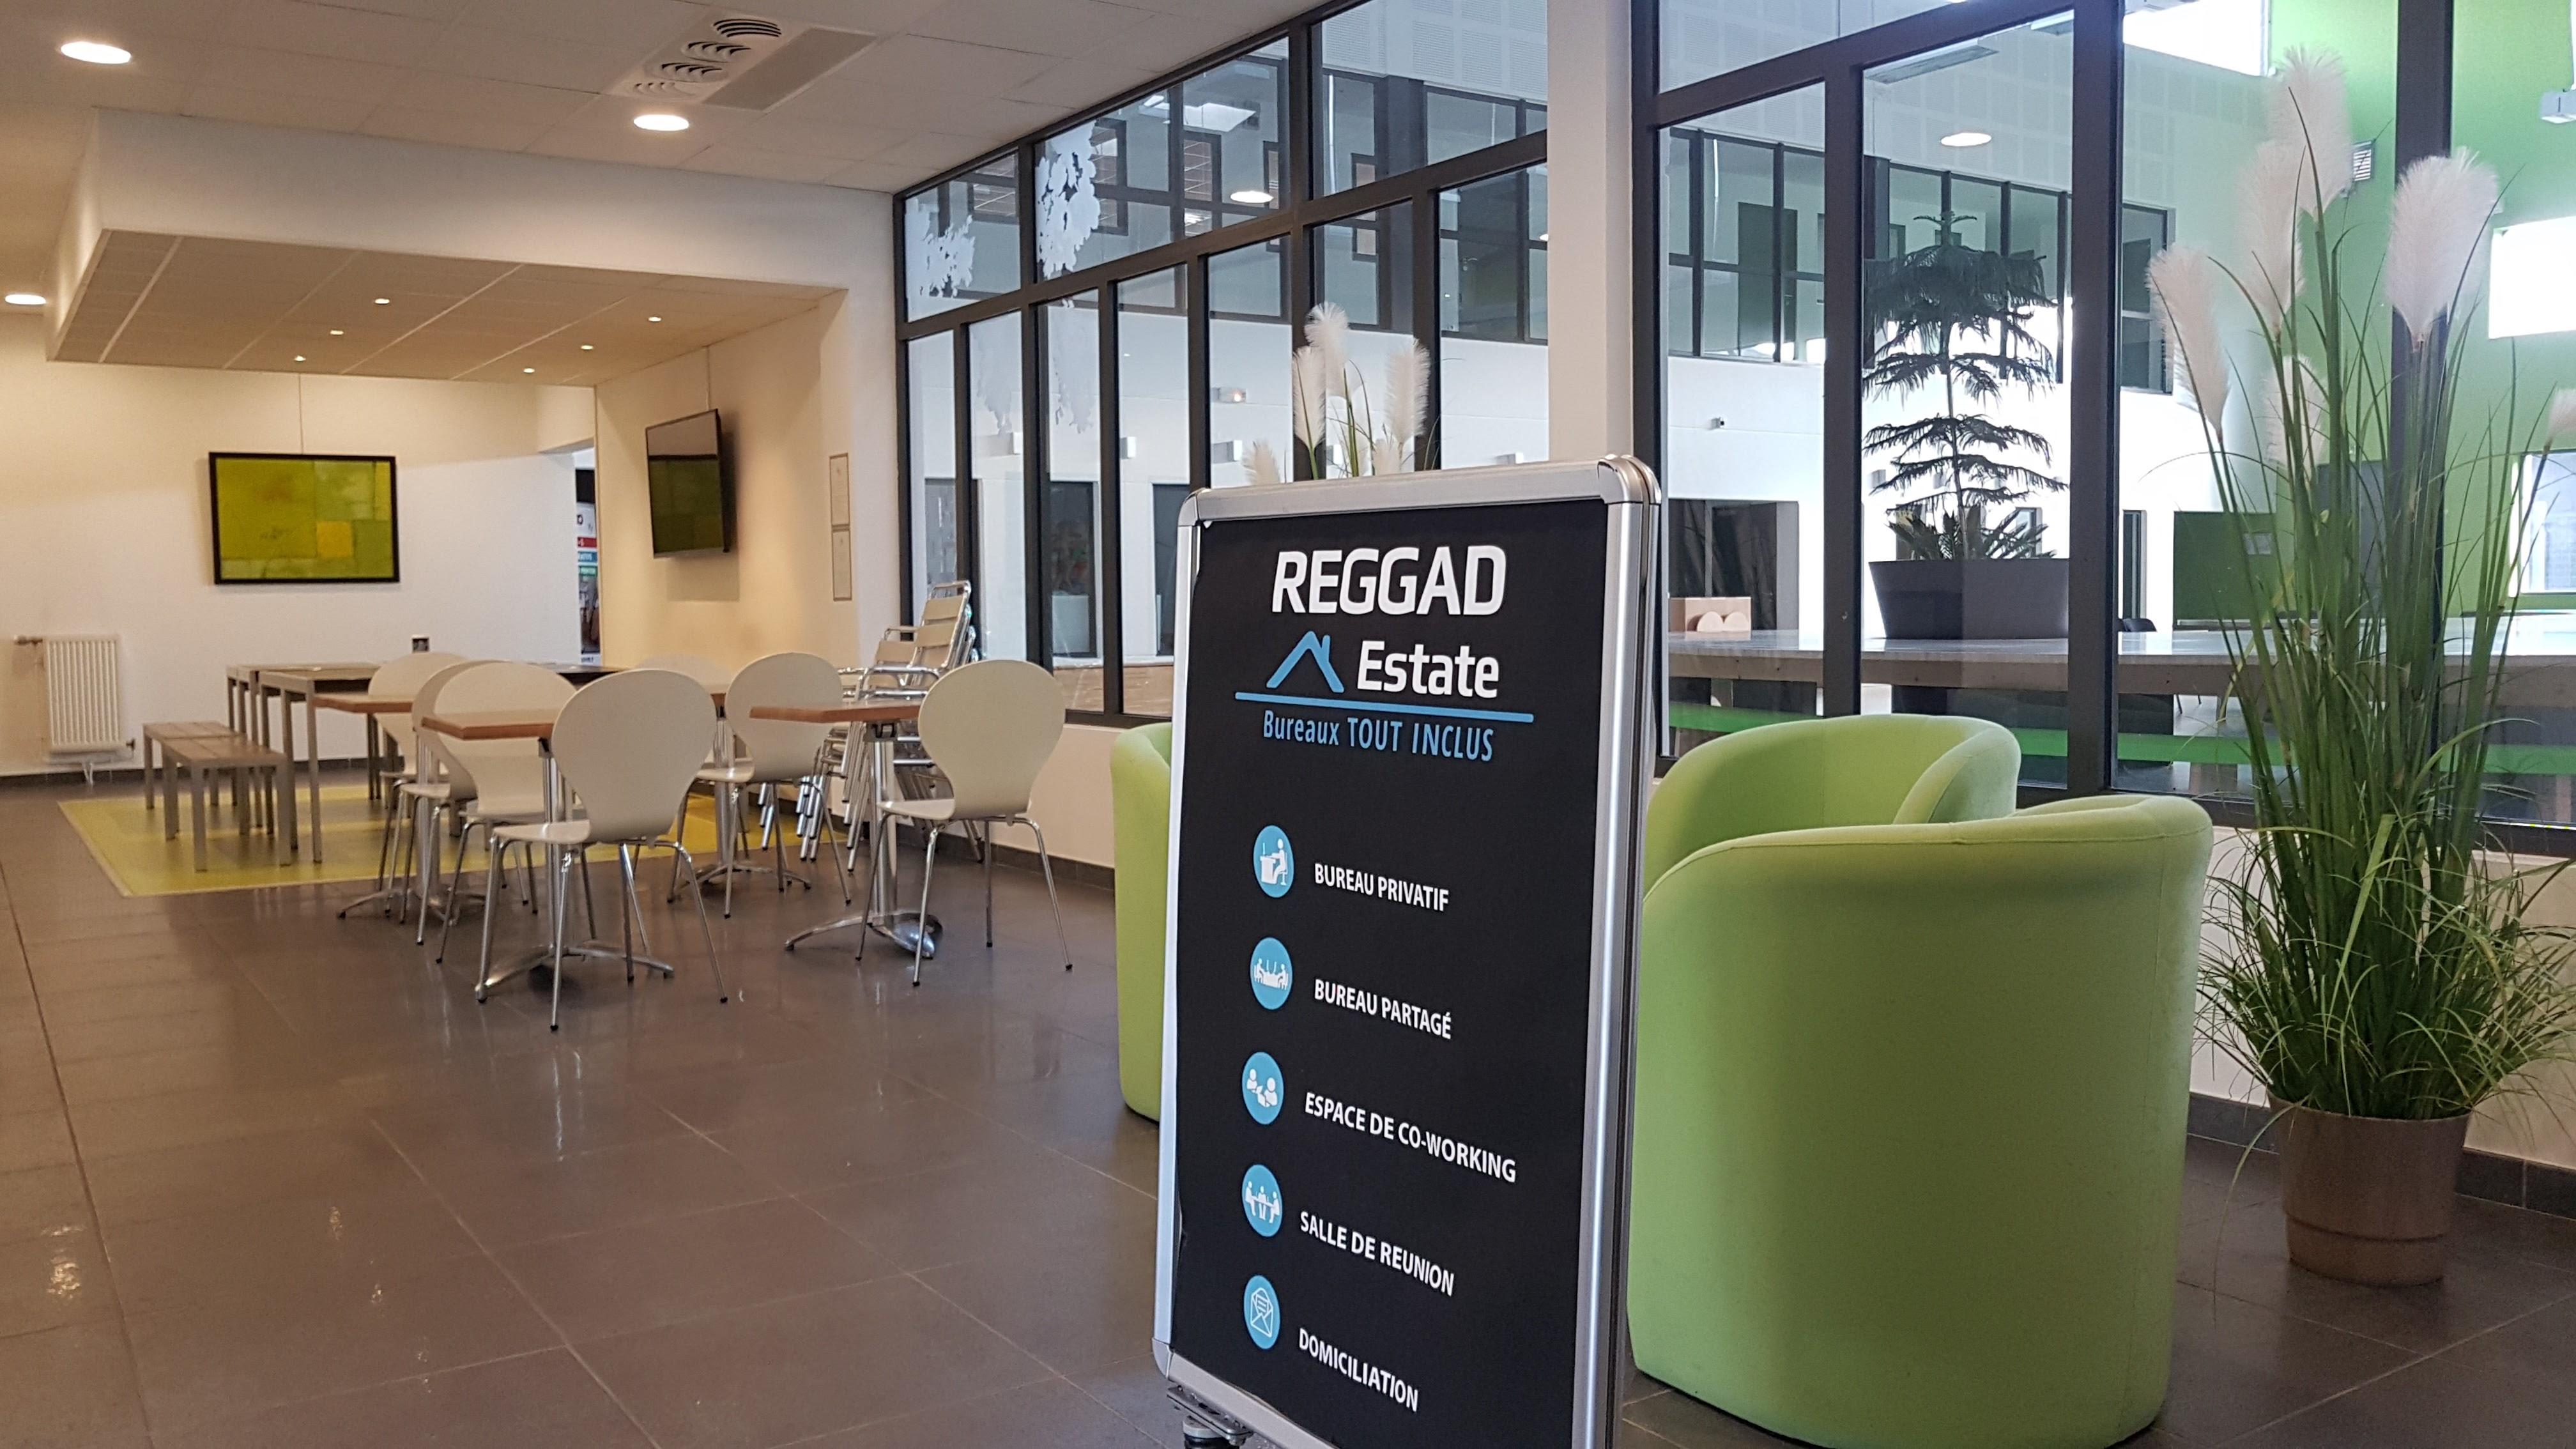 Location bureau reggad estate domiciliation grenoble seminaire